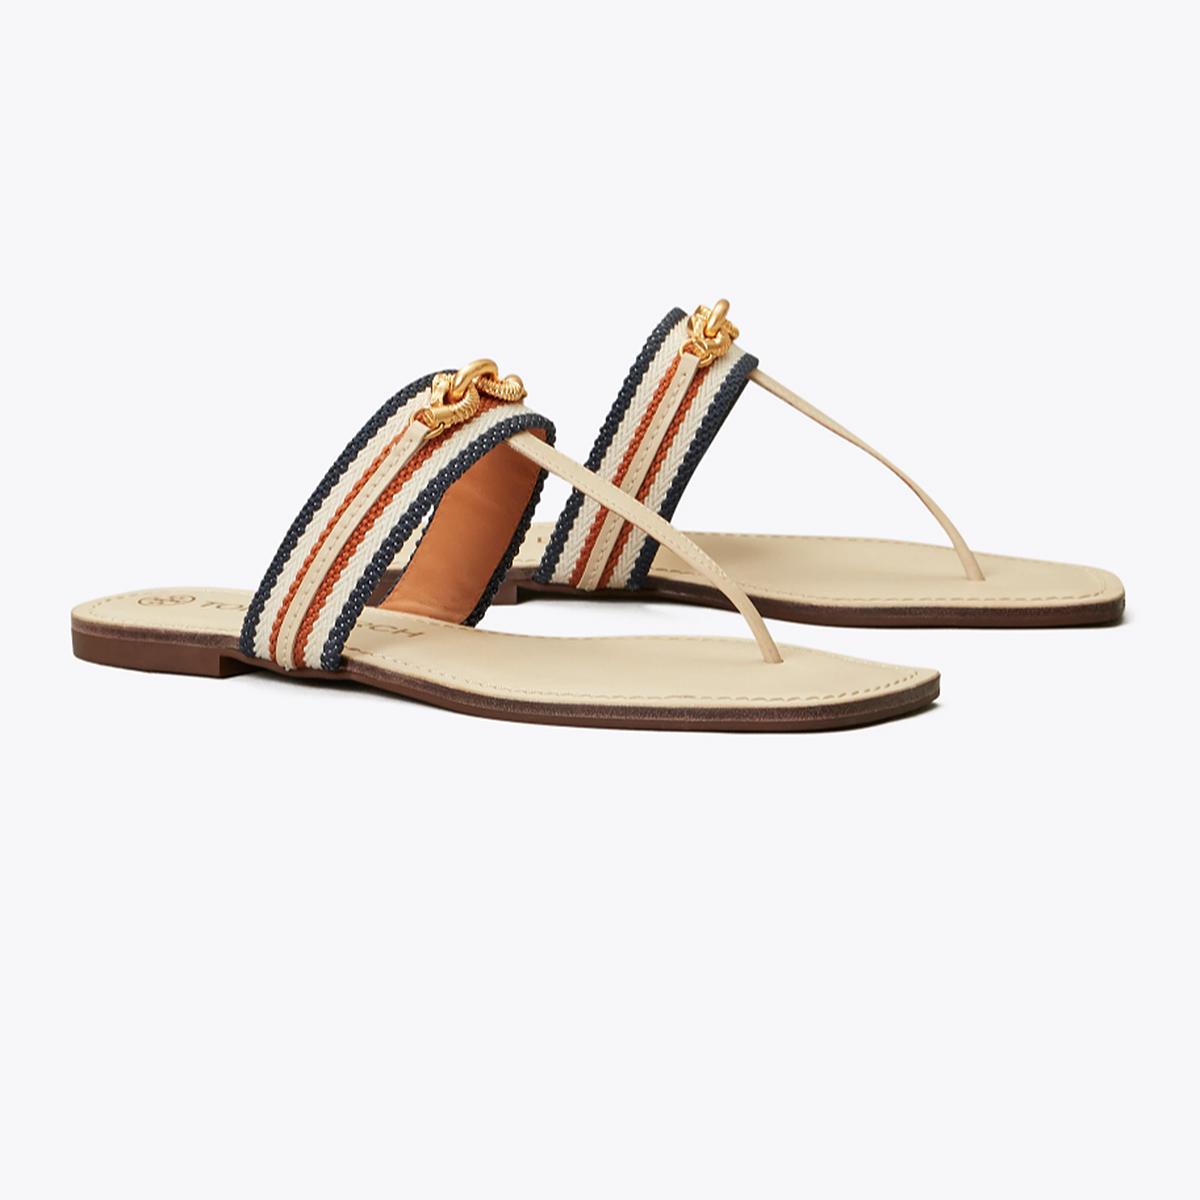 Jessa Thong Sandal